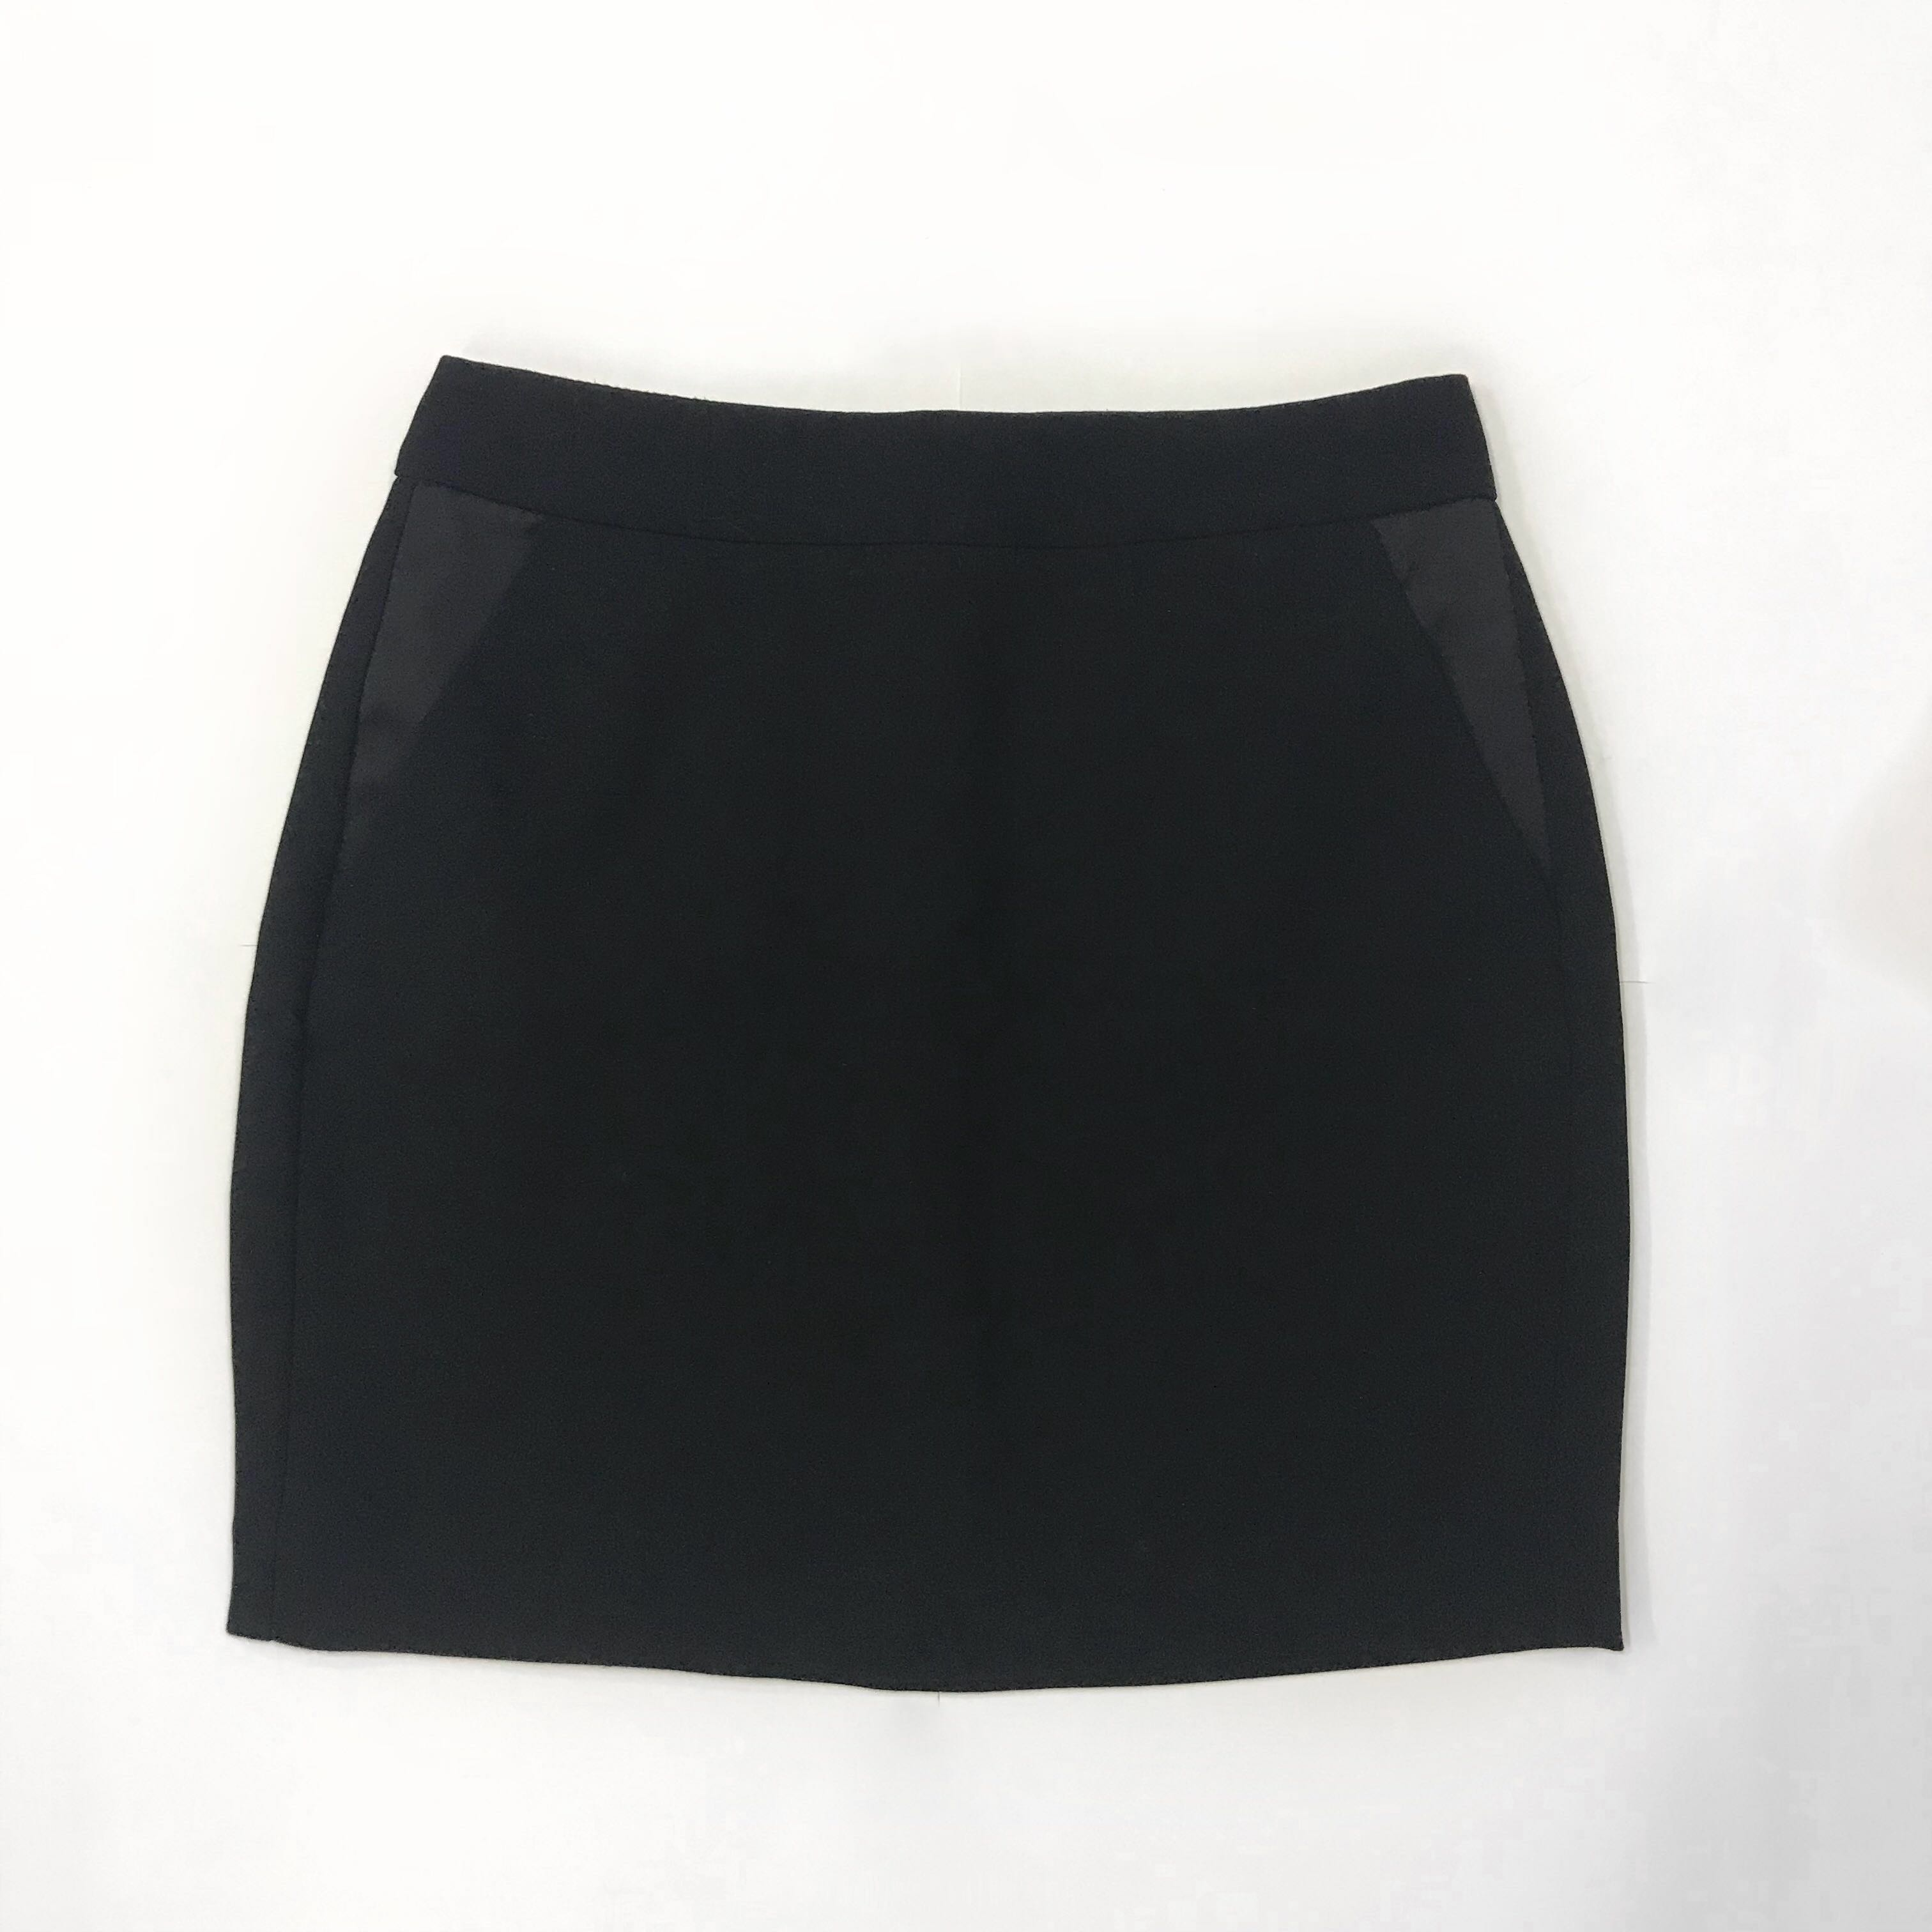 7bafd462c Mango / MNG Mini Work Skirt, Women's Fashion, Clothes, Bottoms on ...